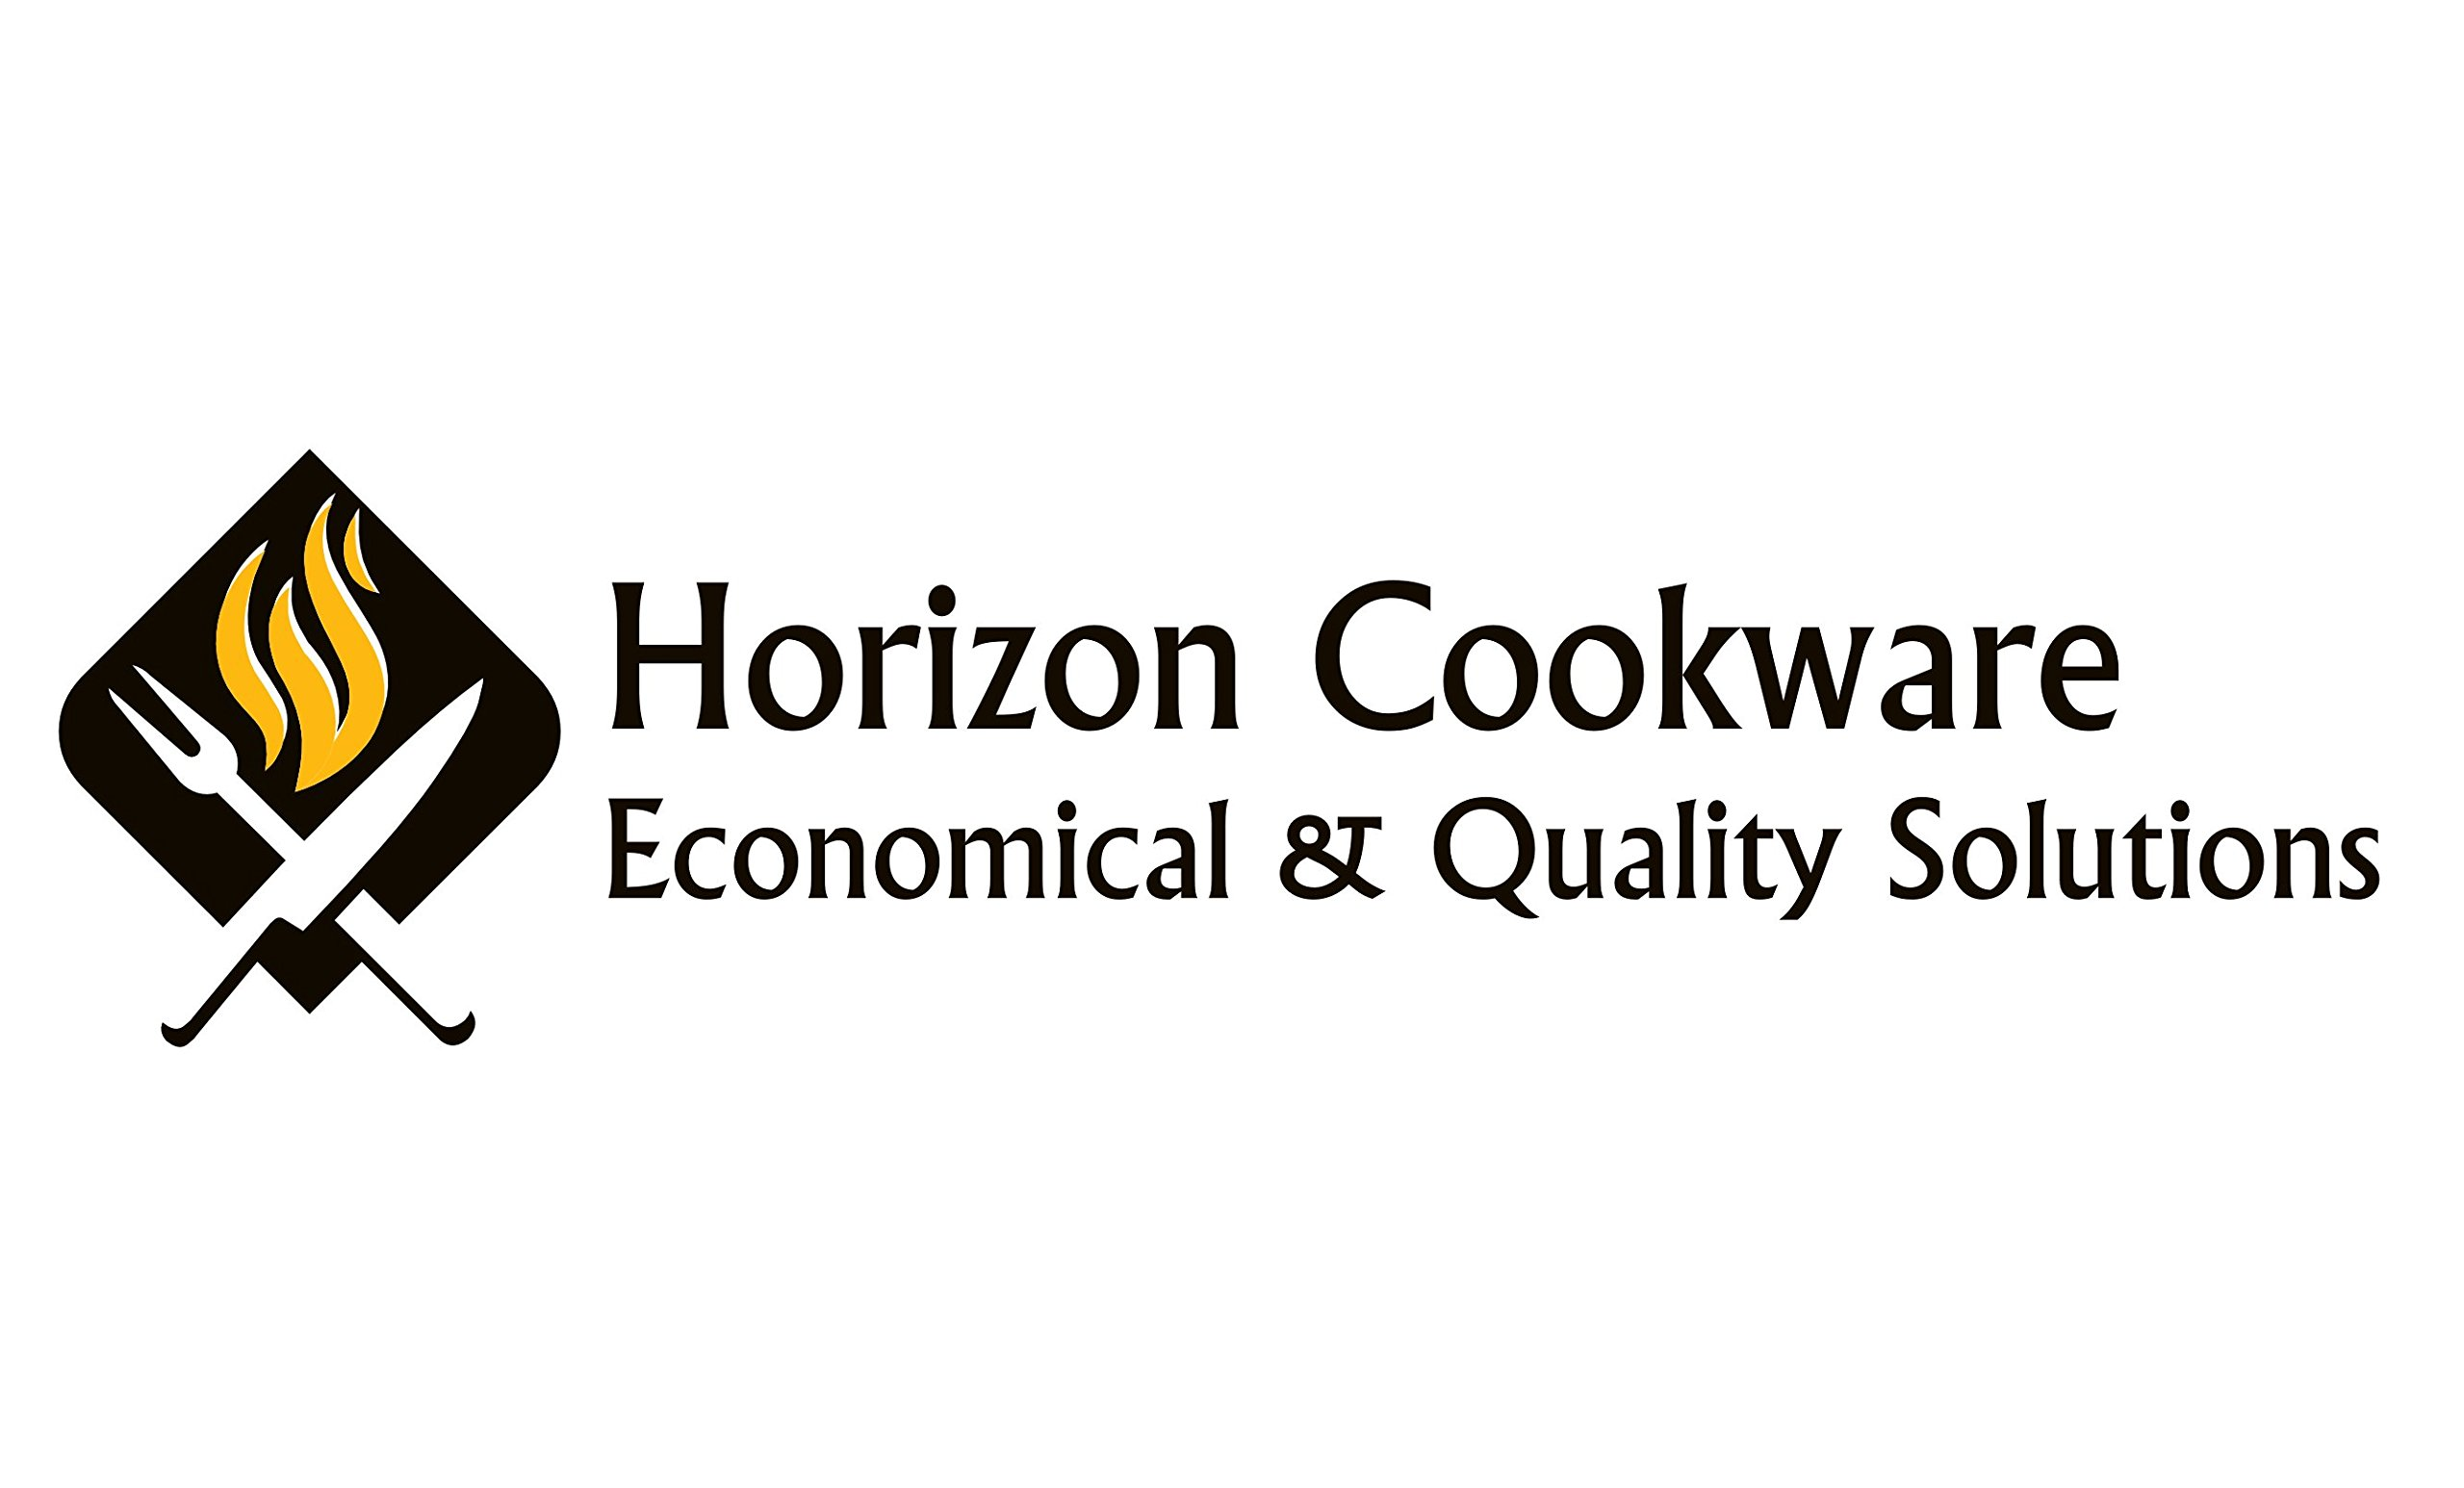 Horizon Cookware 6099 Universal Kitchen Replacement Pot Lid Cover Knob Handle - Black/Silver (5)